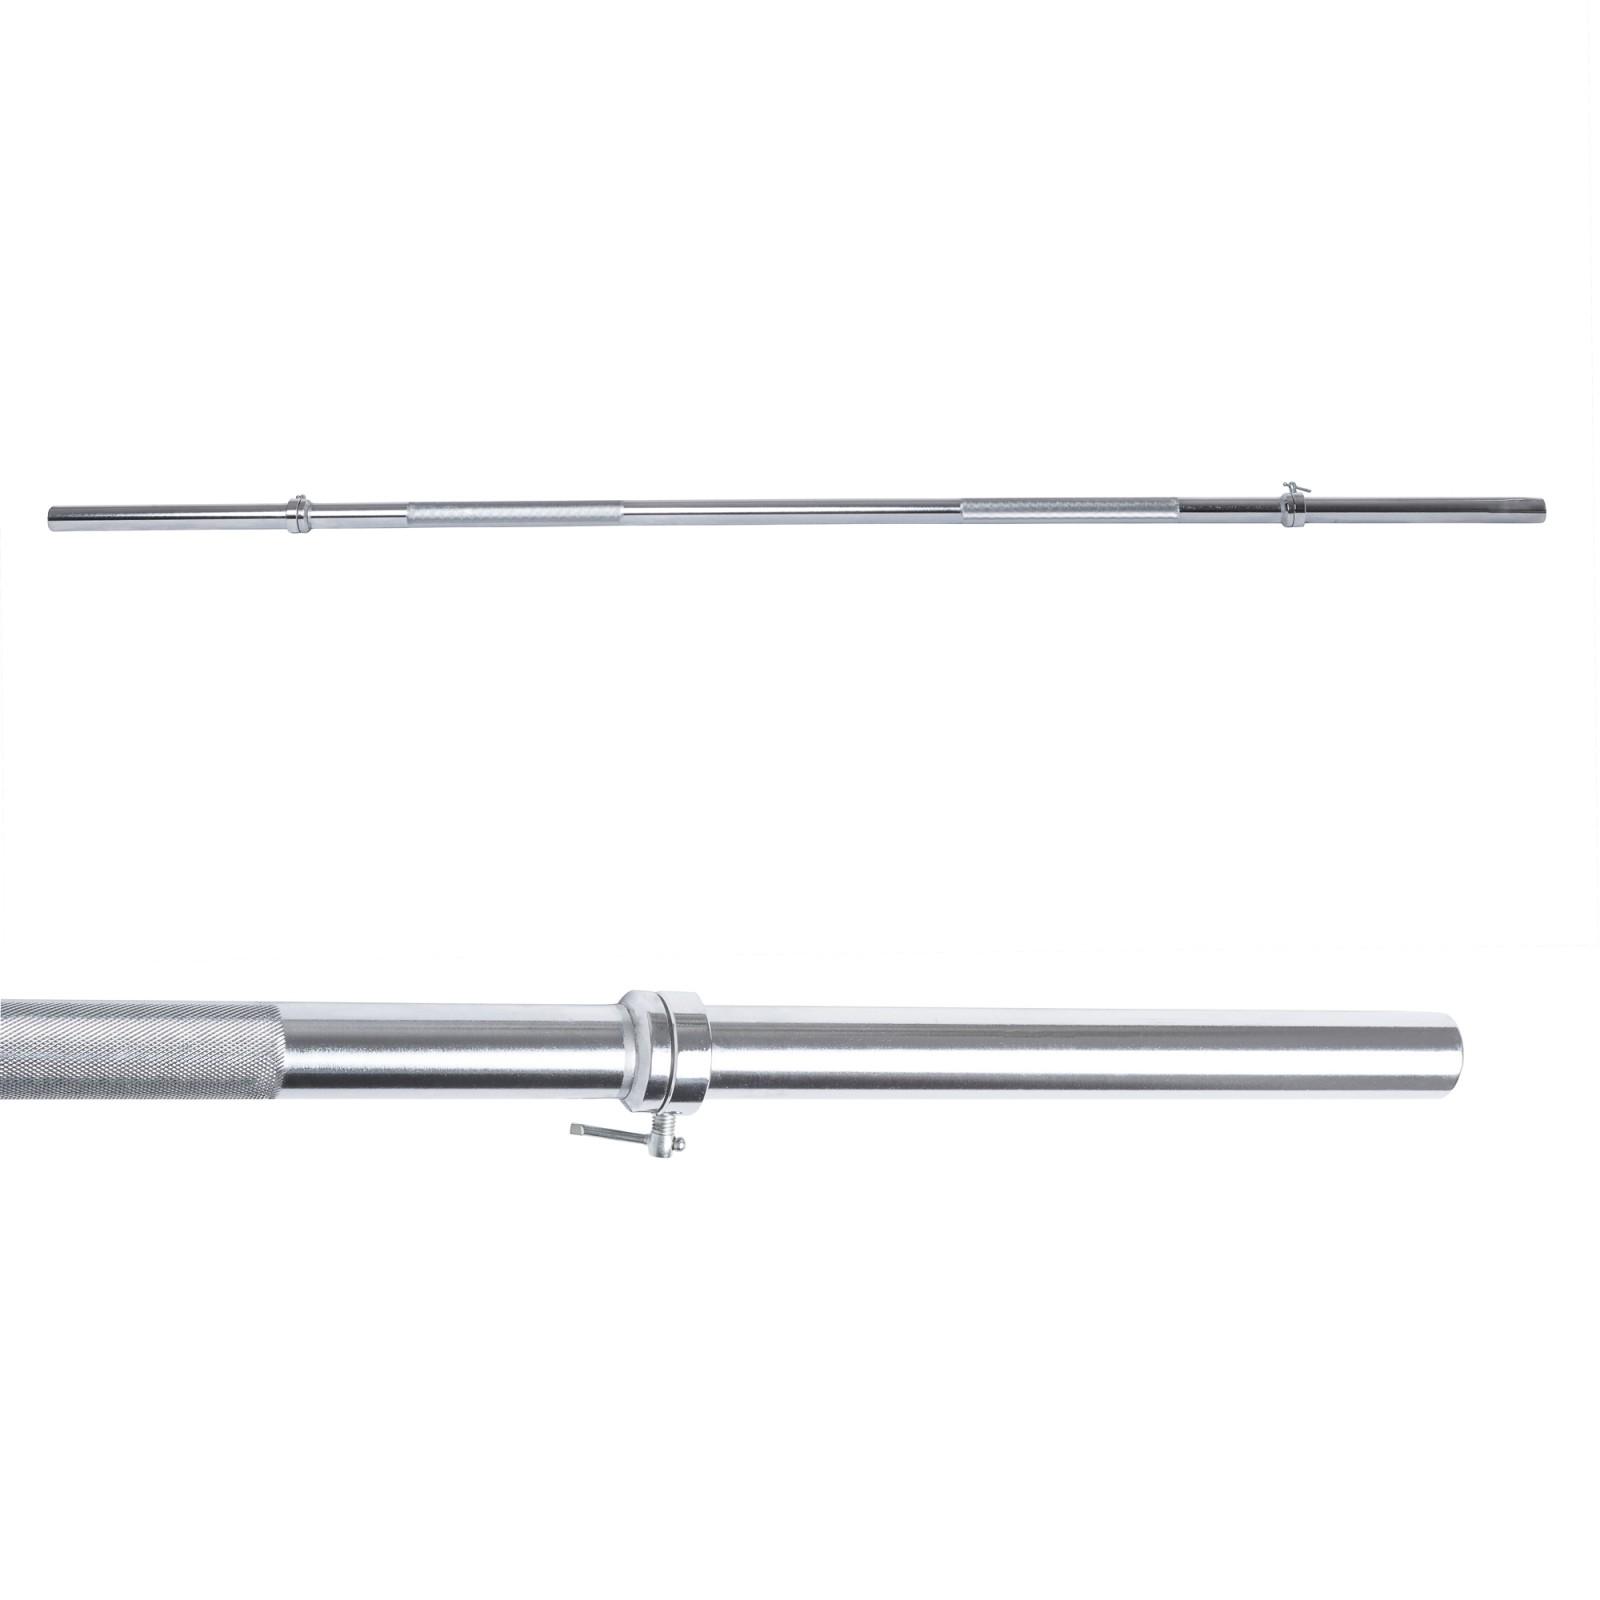 Taurus standaard halterstang 30 mm | Barbell halter 165 cm ...